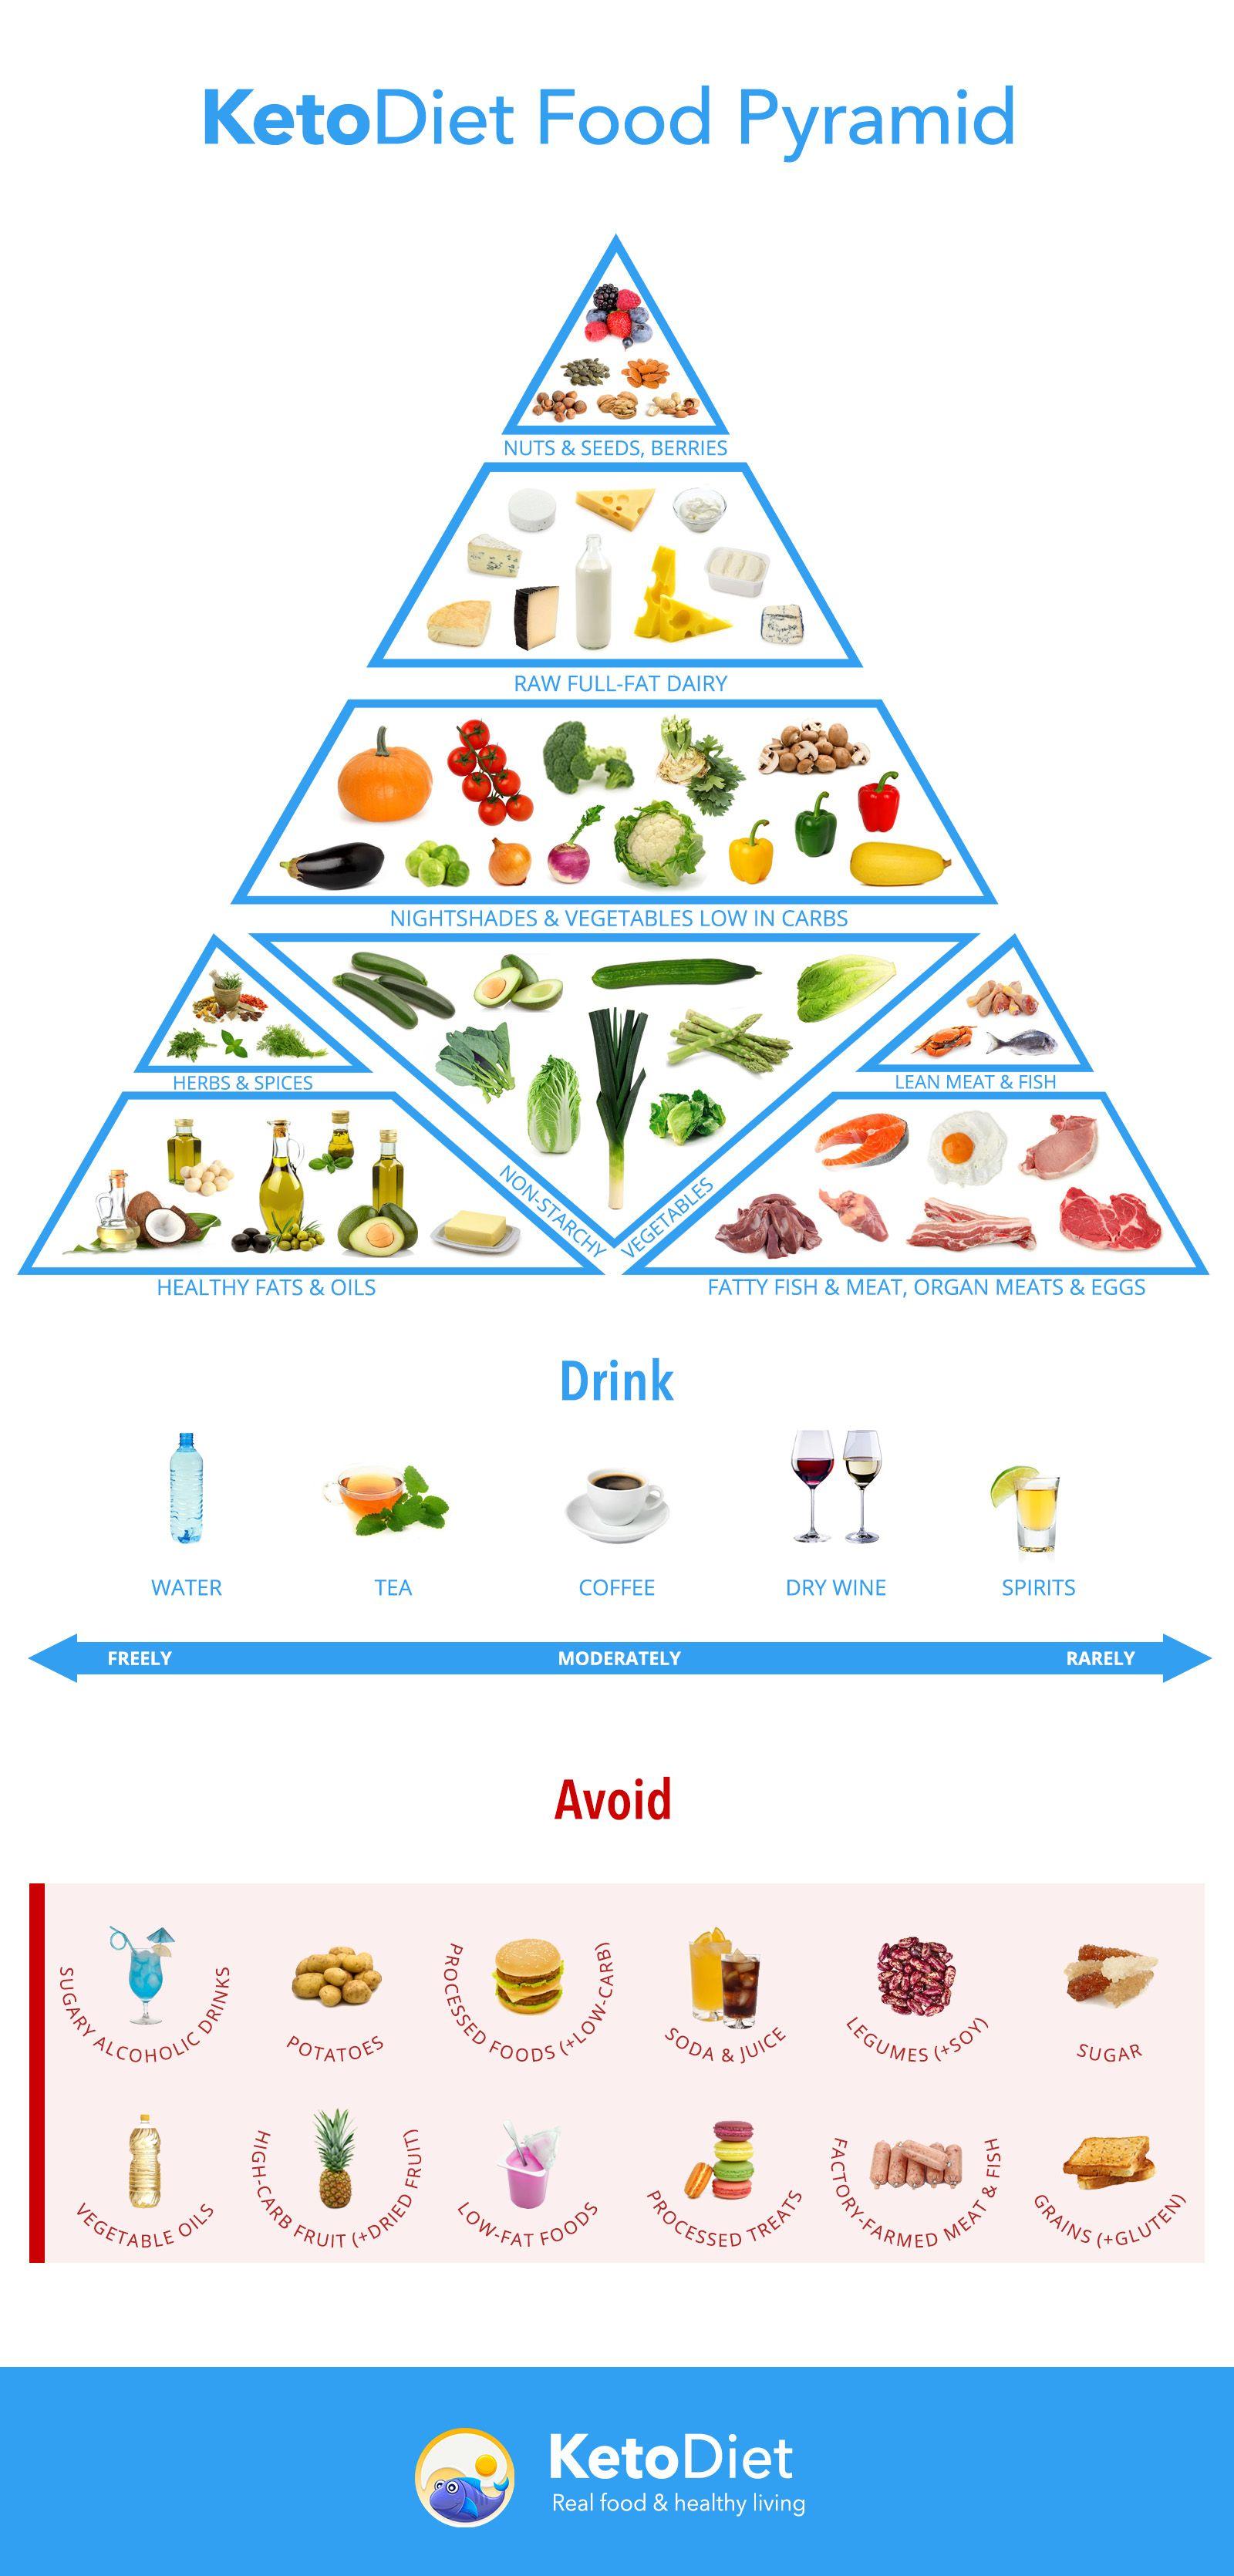 Ketogenicfoodpyramid Highres Jpg 1 600 3 340 Pixeles Dietas